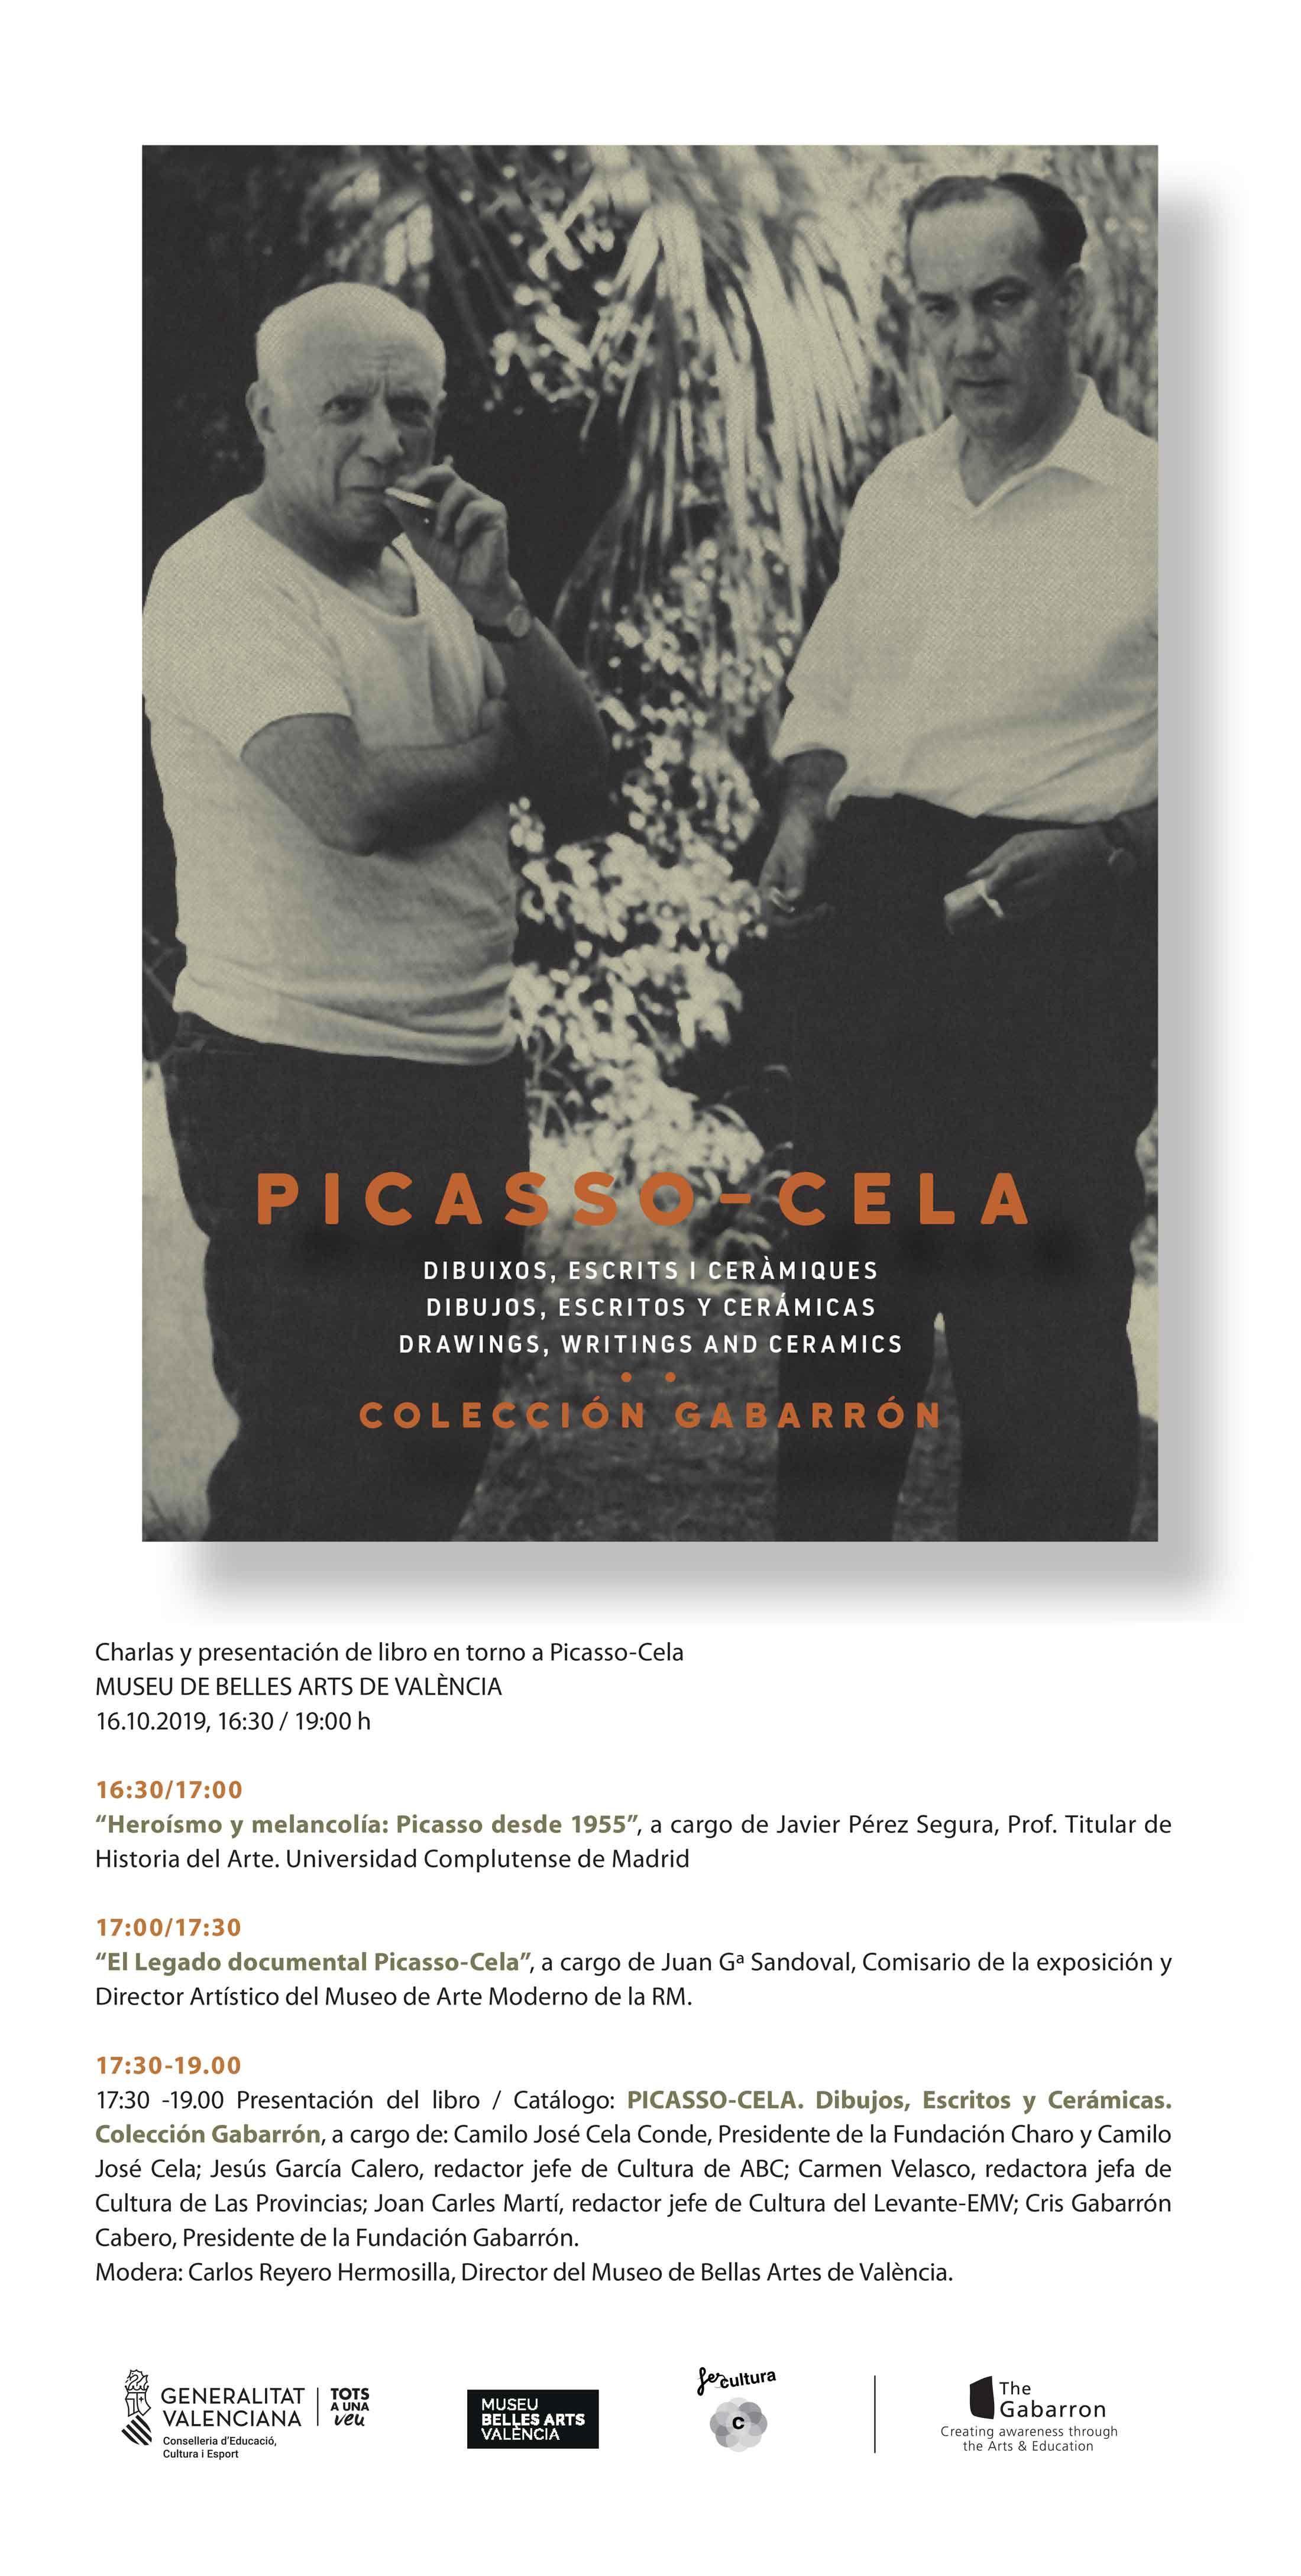 Jornadas Picasso-Cela & Presentación del libro Catálogo